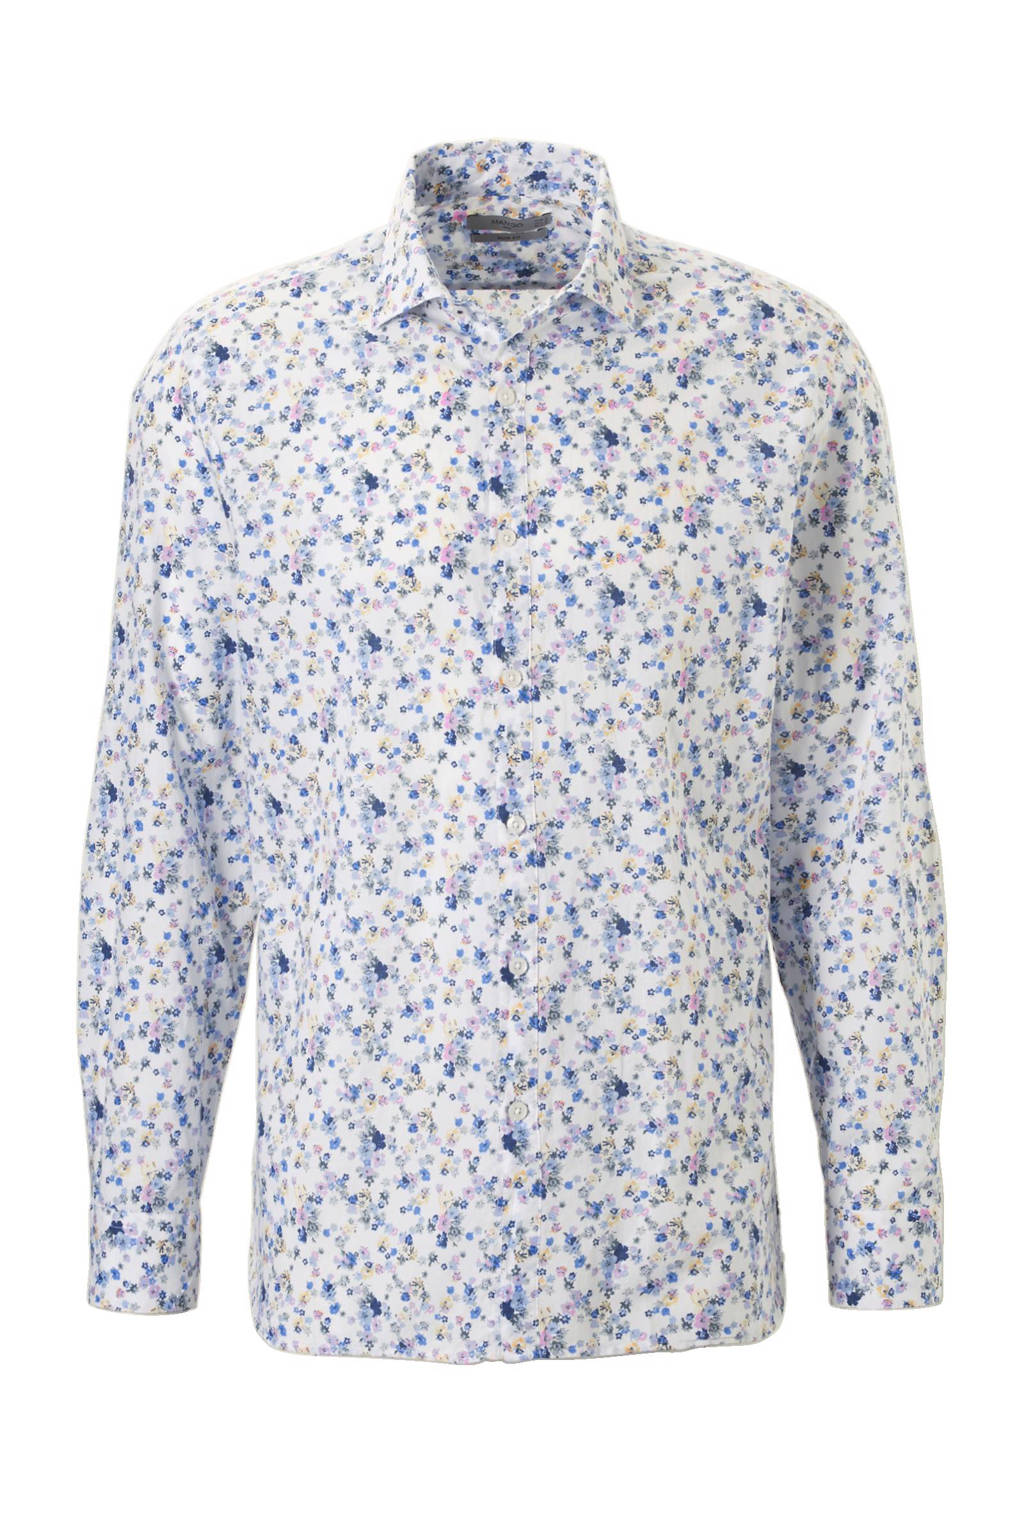 Heren Overhemd Bloemenprint.Mango Man Slim Fit Overhemd Bloemenprint Blauw Wehkamp